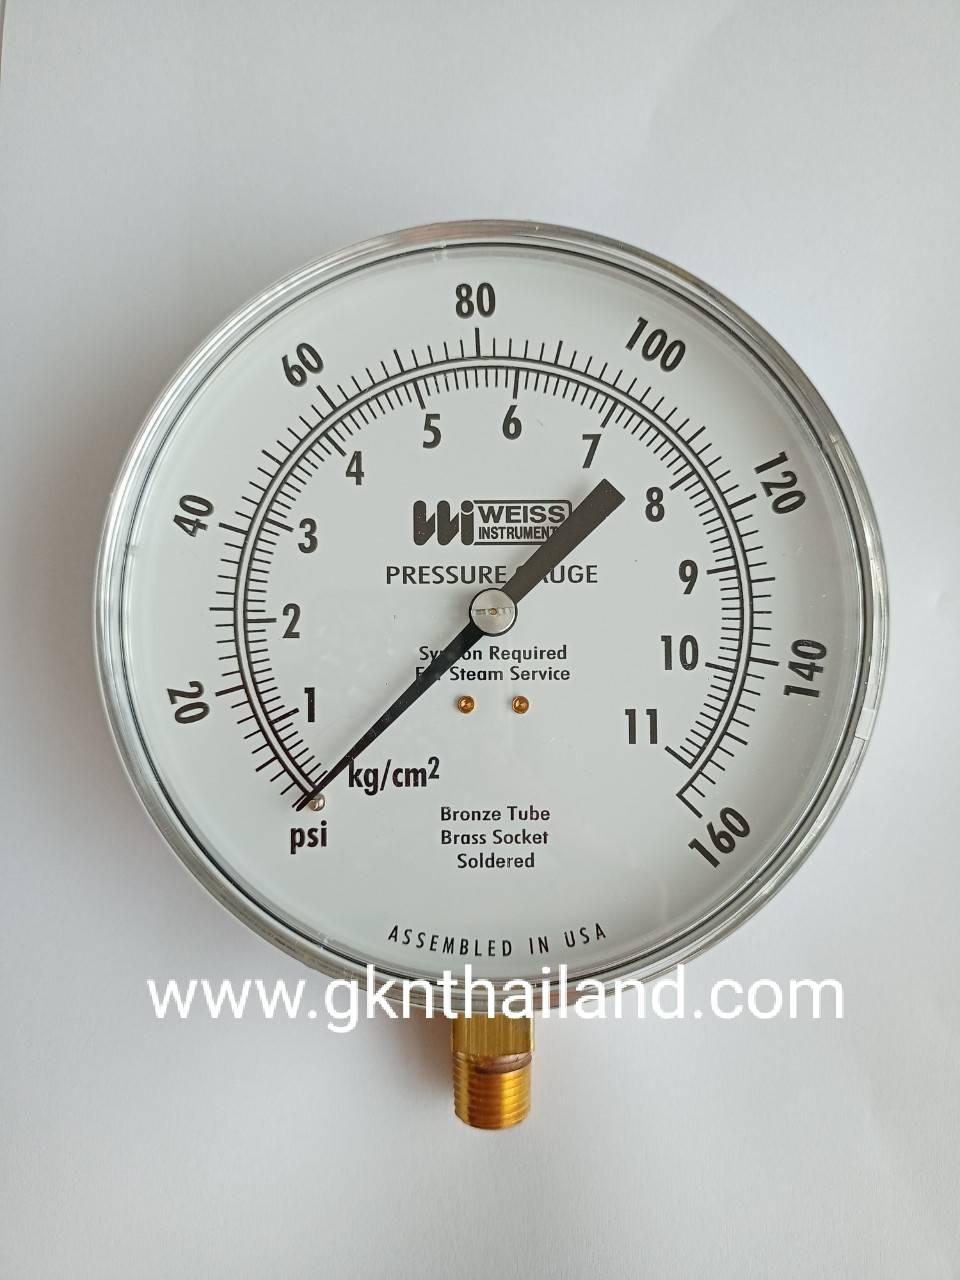 """WEISS"" Pressure gauge Model : 4CTS-1 Range 0-160 psi & 0-11 kg/cm2 Body : sus304 Dial.4.5"" Conn.brass 1/4""npt Bottom เกจวัดแรงดัน ยี่ห้อ ""Weiss"" รุ่น 4CTS-1 แรงดัน 0-160 psi & 0-11 kg/cm2 ขนาดหน้าปัทม์ 4.5"" ตัวเ"